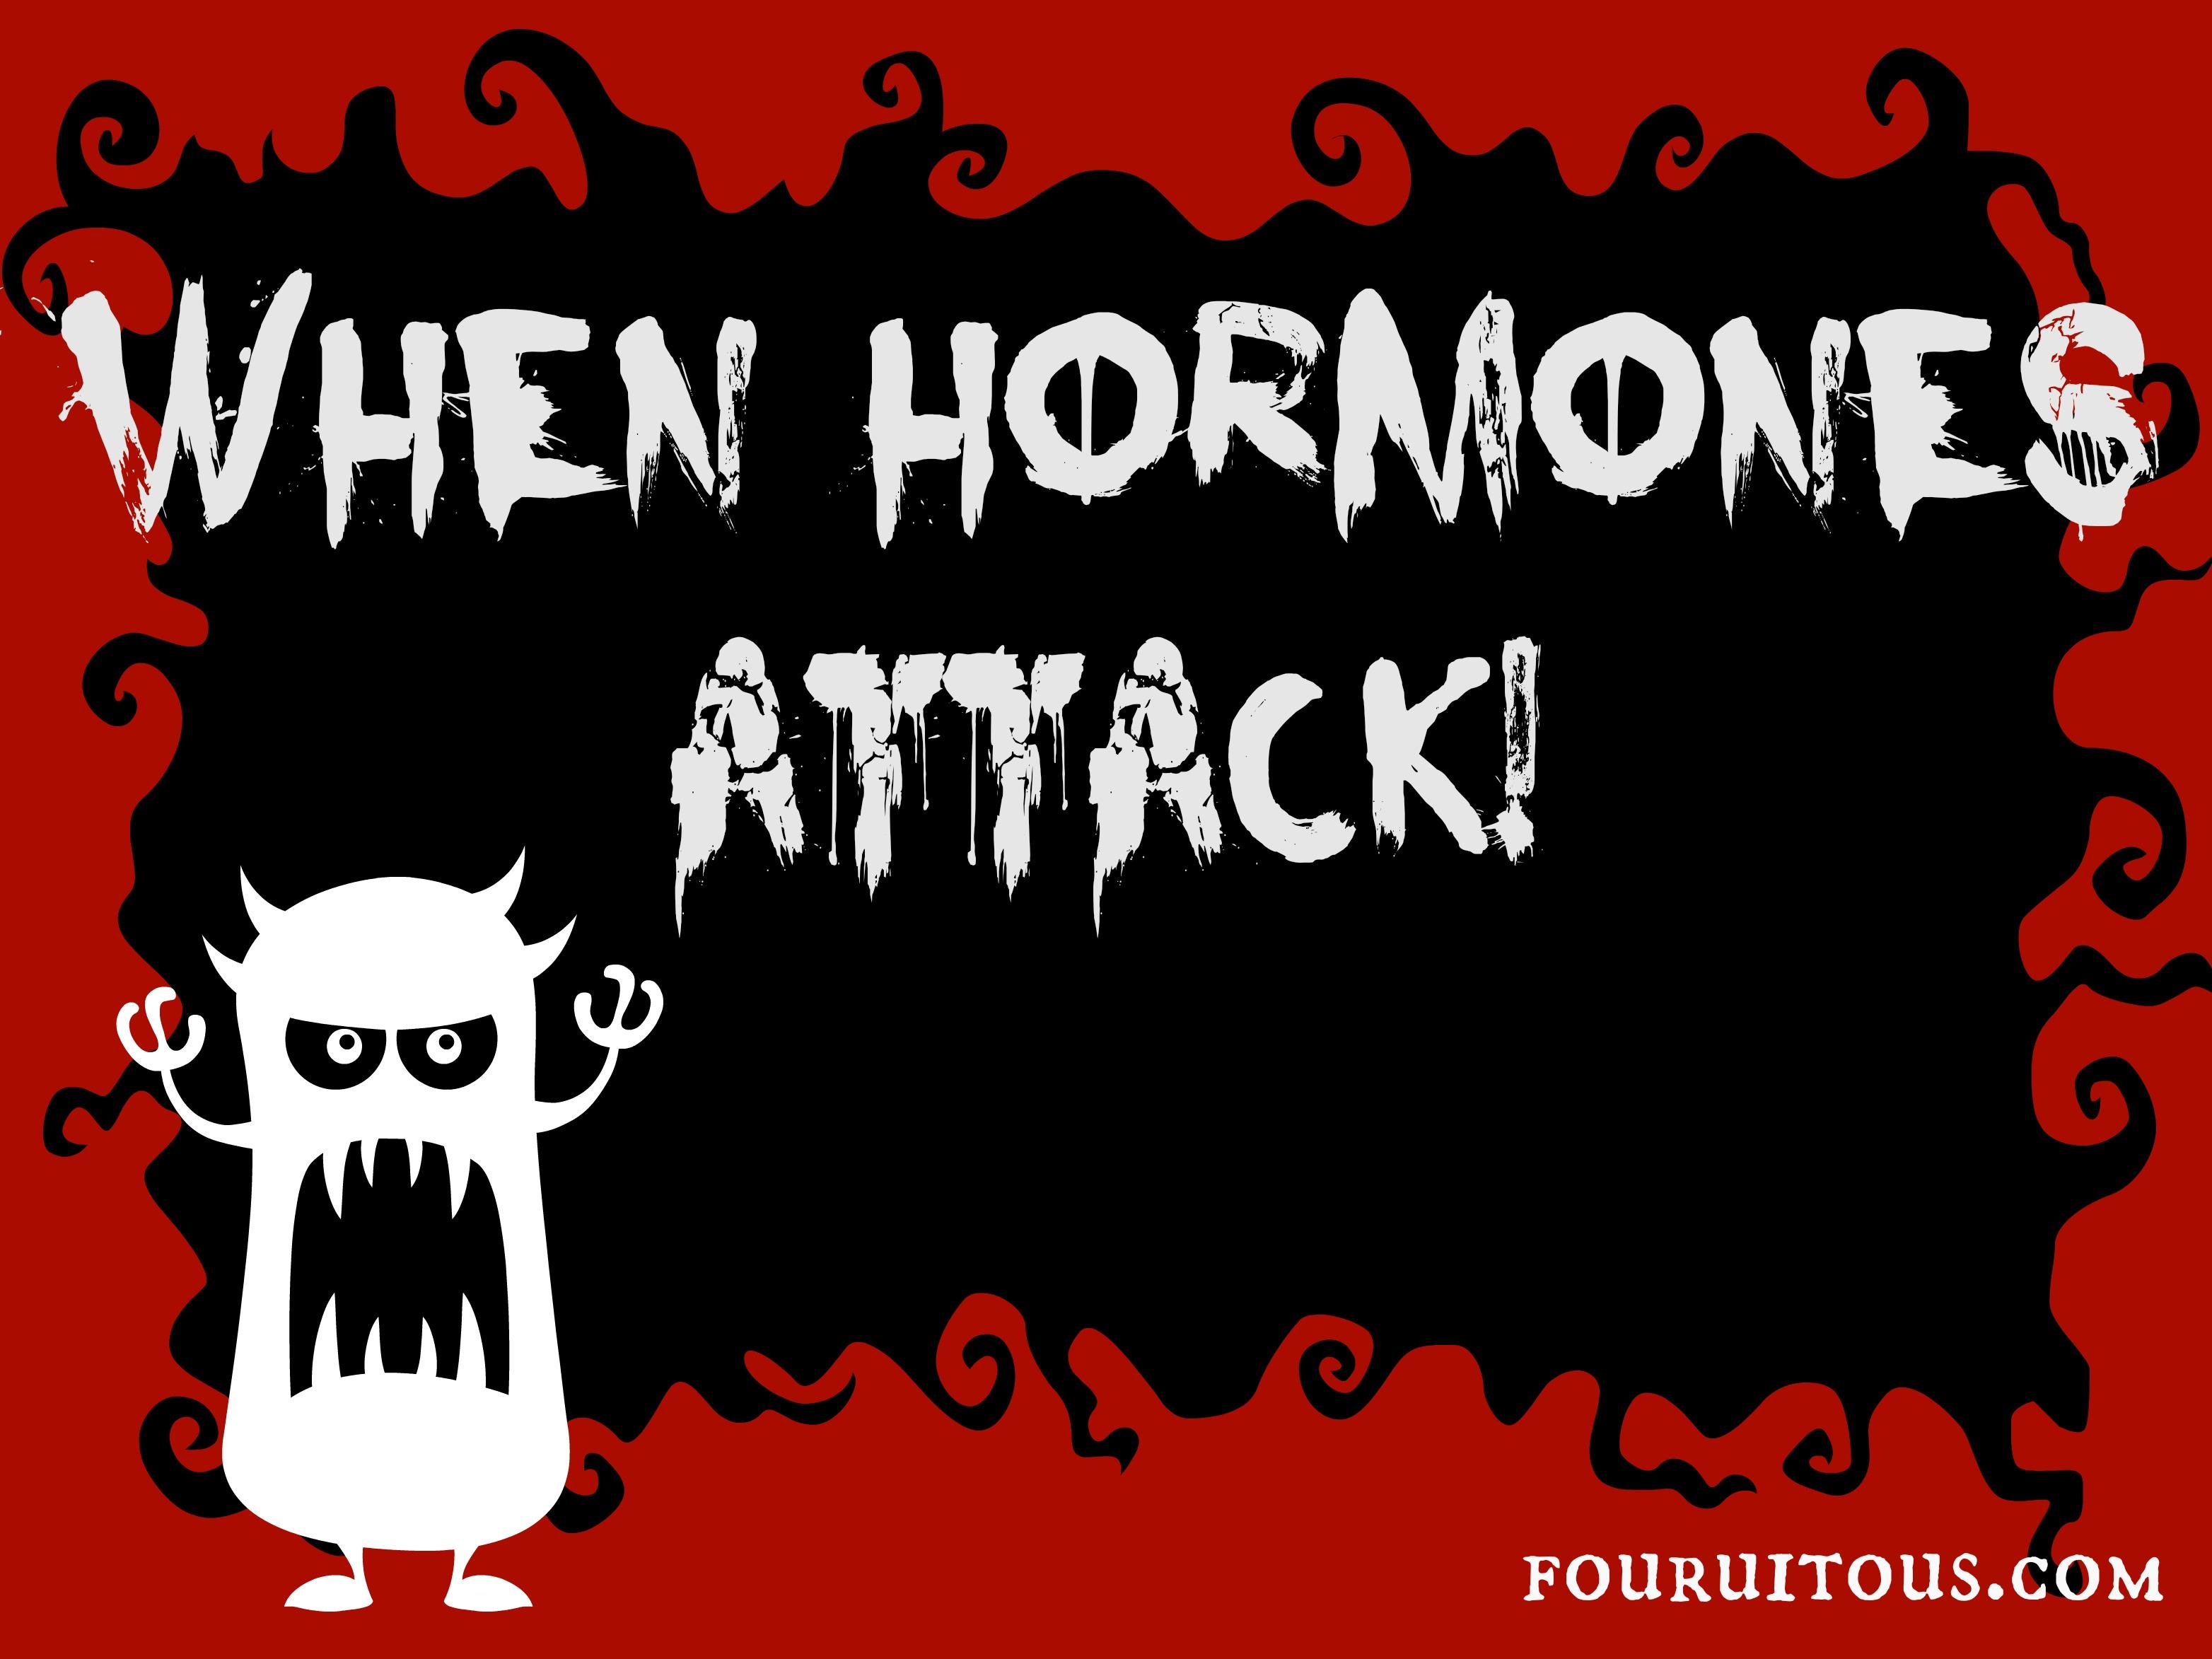 whenhormonesattack